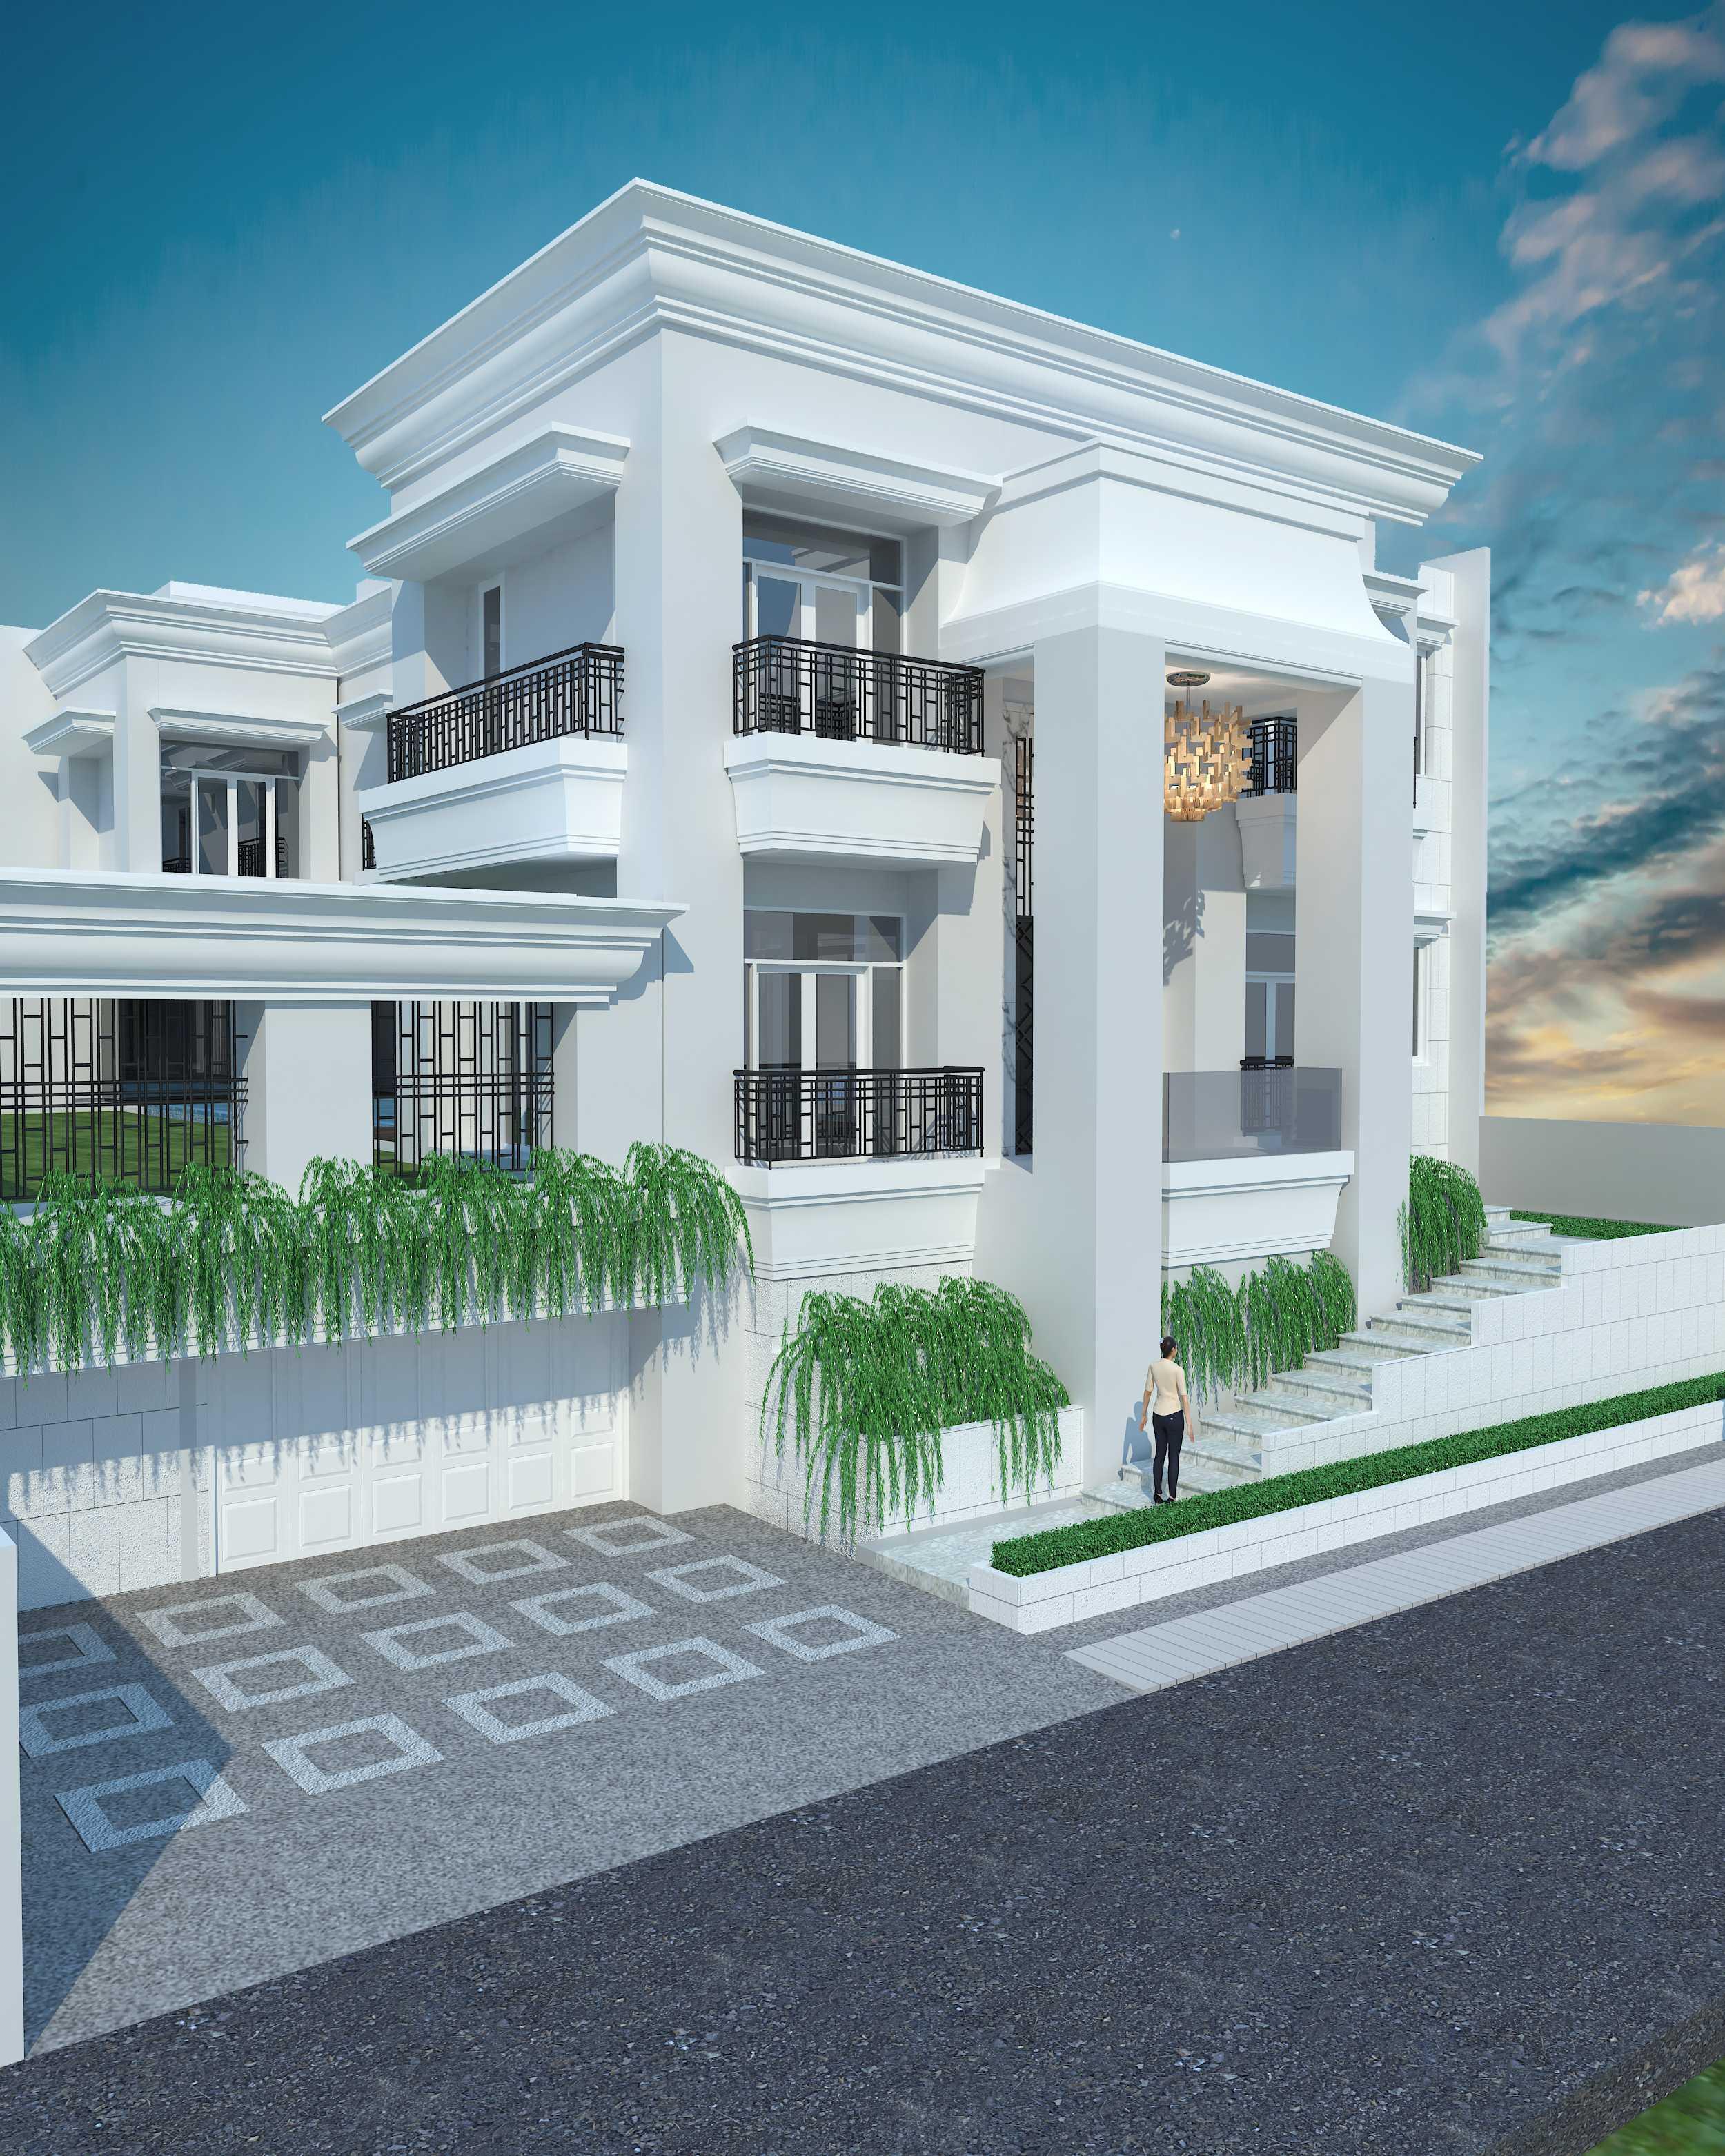 Alradistadesign Aa House Bintaro, Pesanggrahan, South Jakarta City, Jakarta, Indonesia Bintaro, Pesanggrahan, South Jakarta City, Jakarta, Indonesia Modern Classic Modern  35310